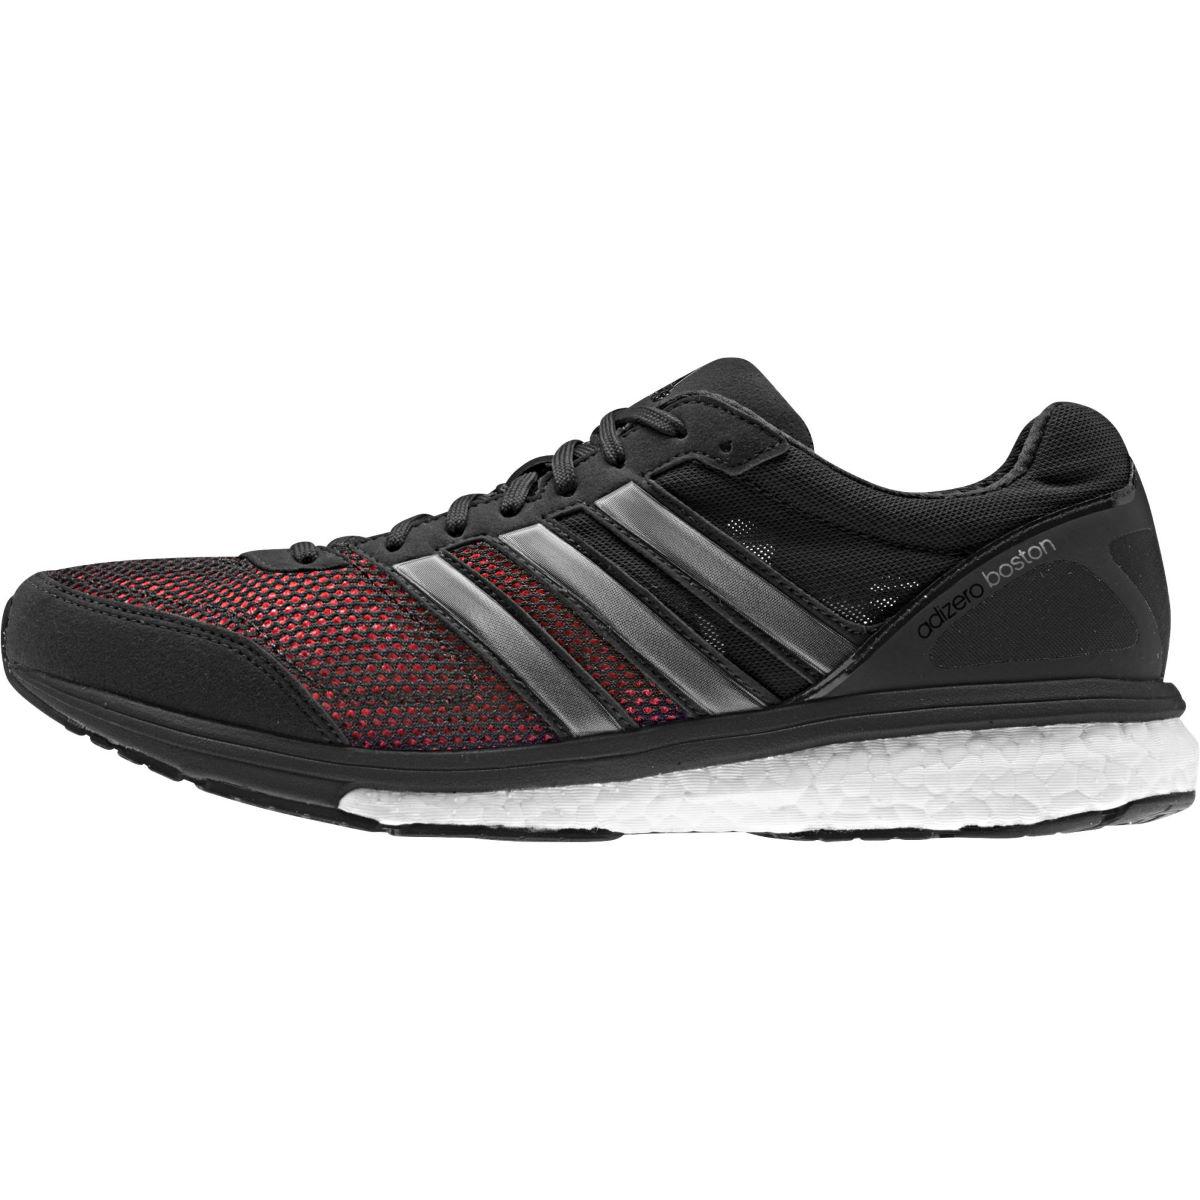 Coincidencia compacto Aprovechar  Zapatillas Adidas Adizero Boston Boost 5 (PV16) - Zapatillas de atletismo  Referencia 4055017536833 · Whimed.com